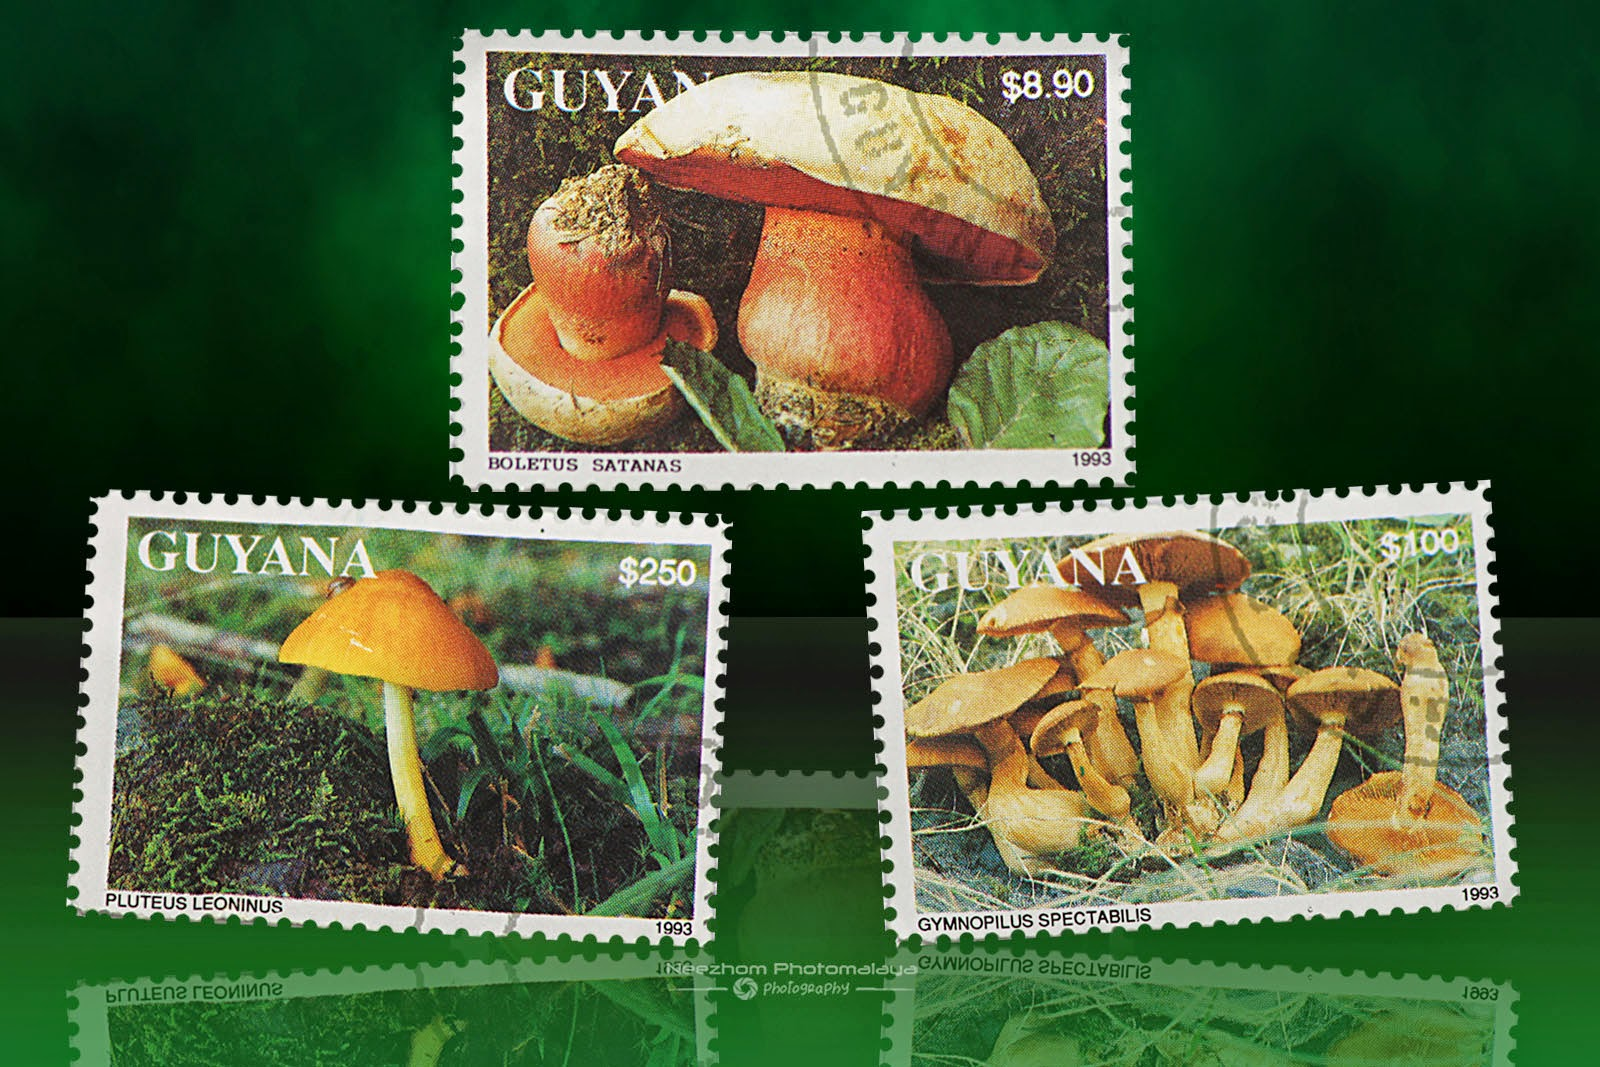 Setem cendawan Guyana 1993